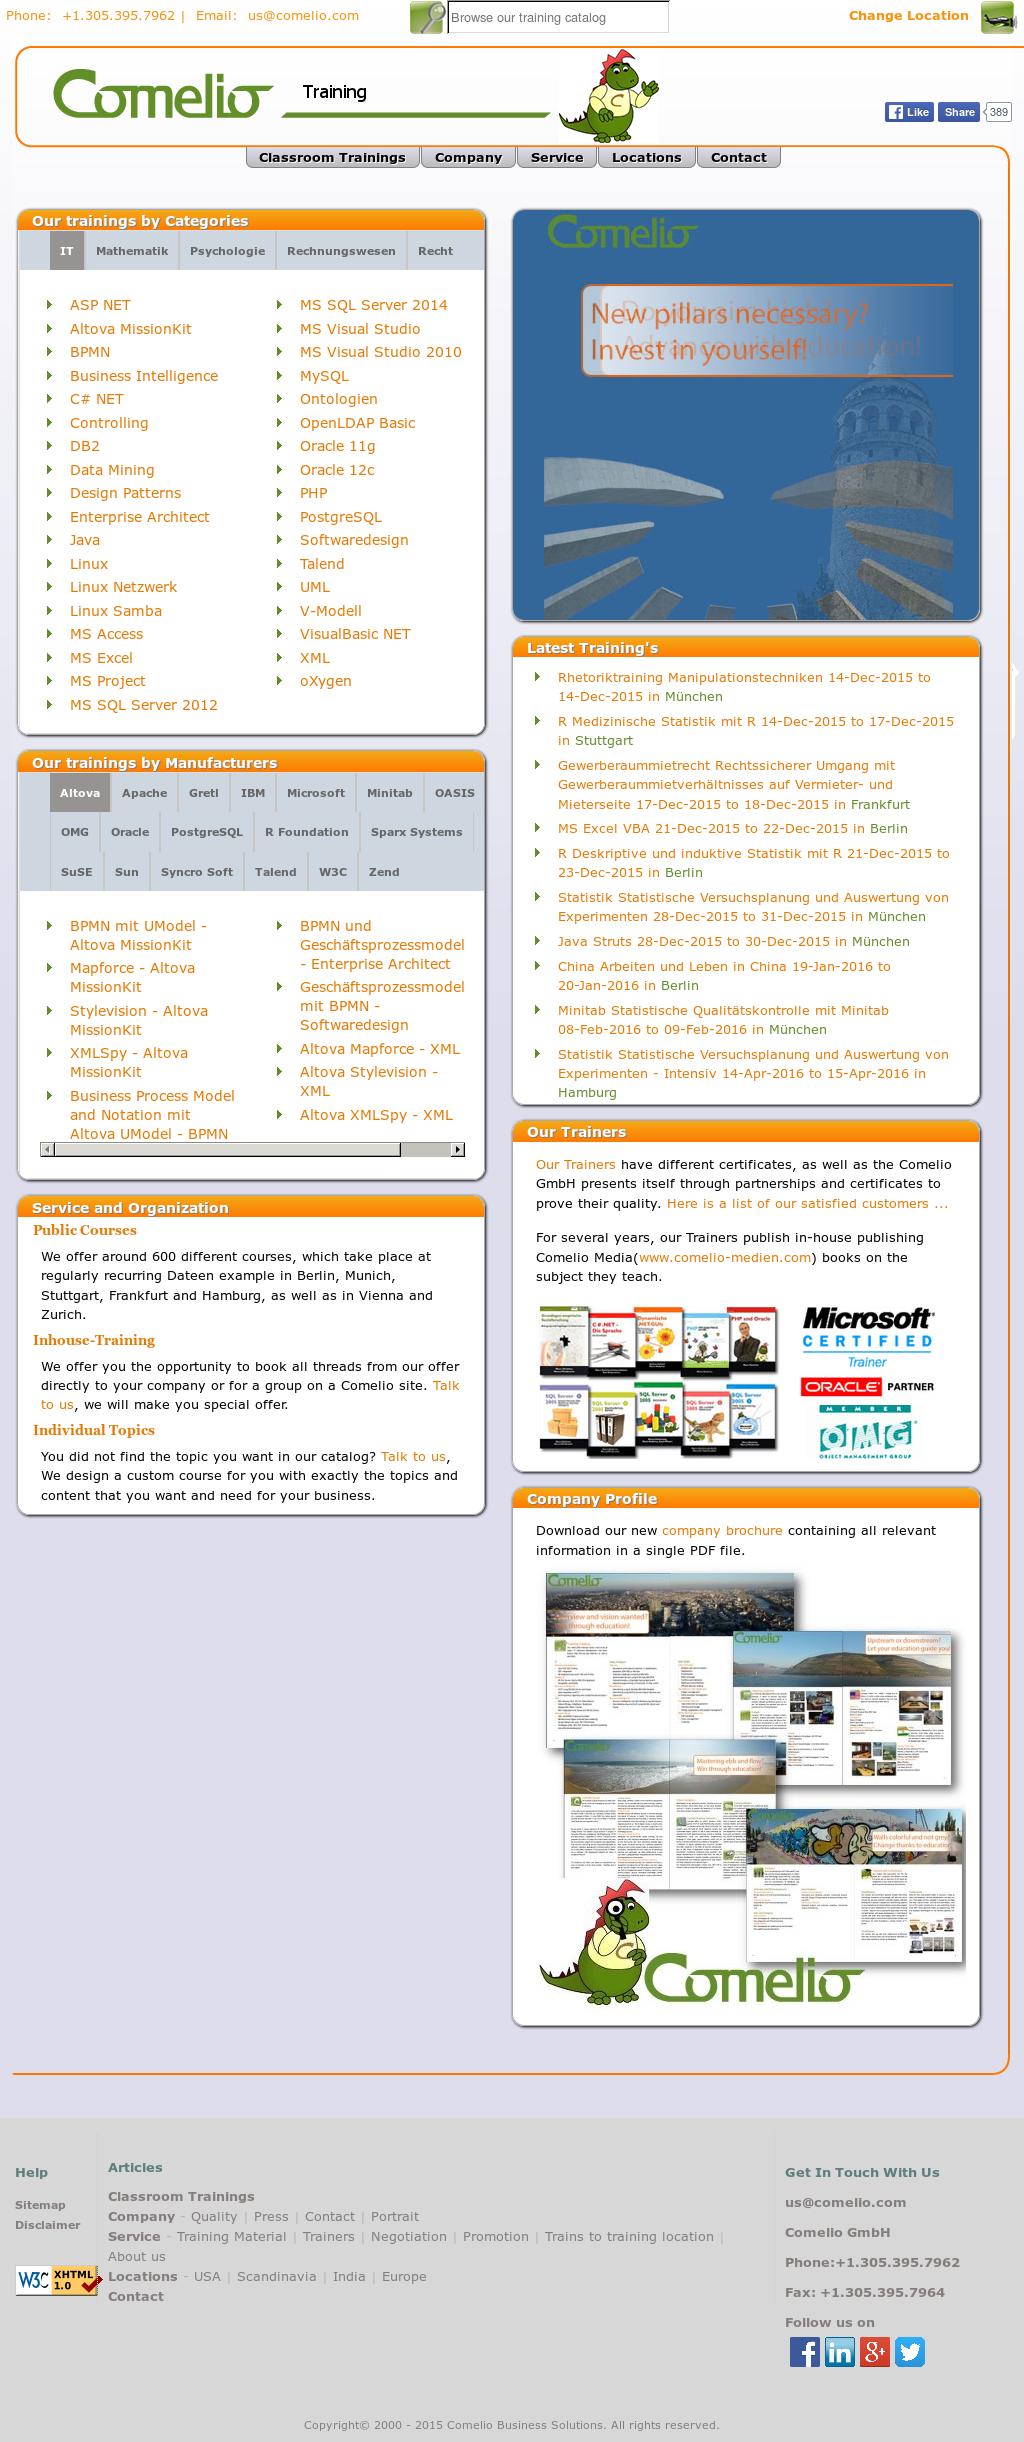 Comelio Business Solutions Competitors, Revenue and